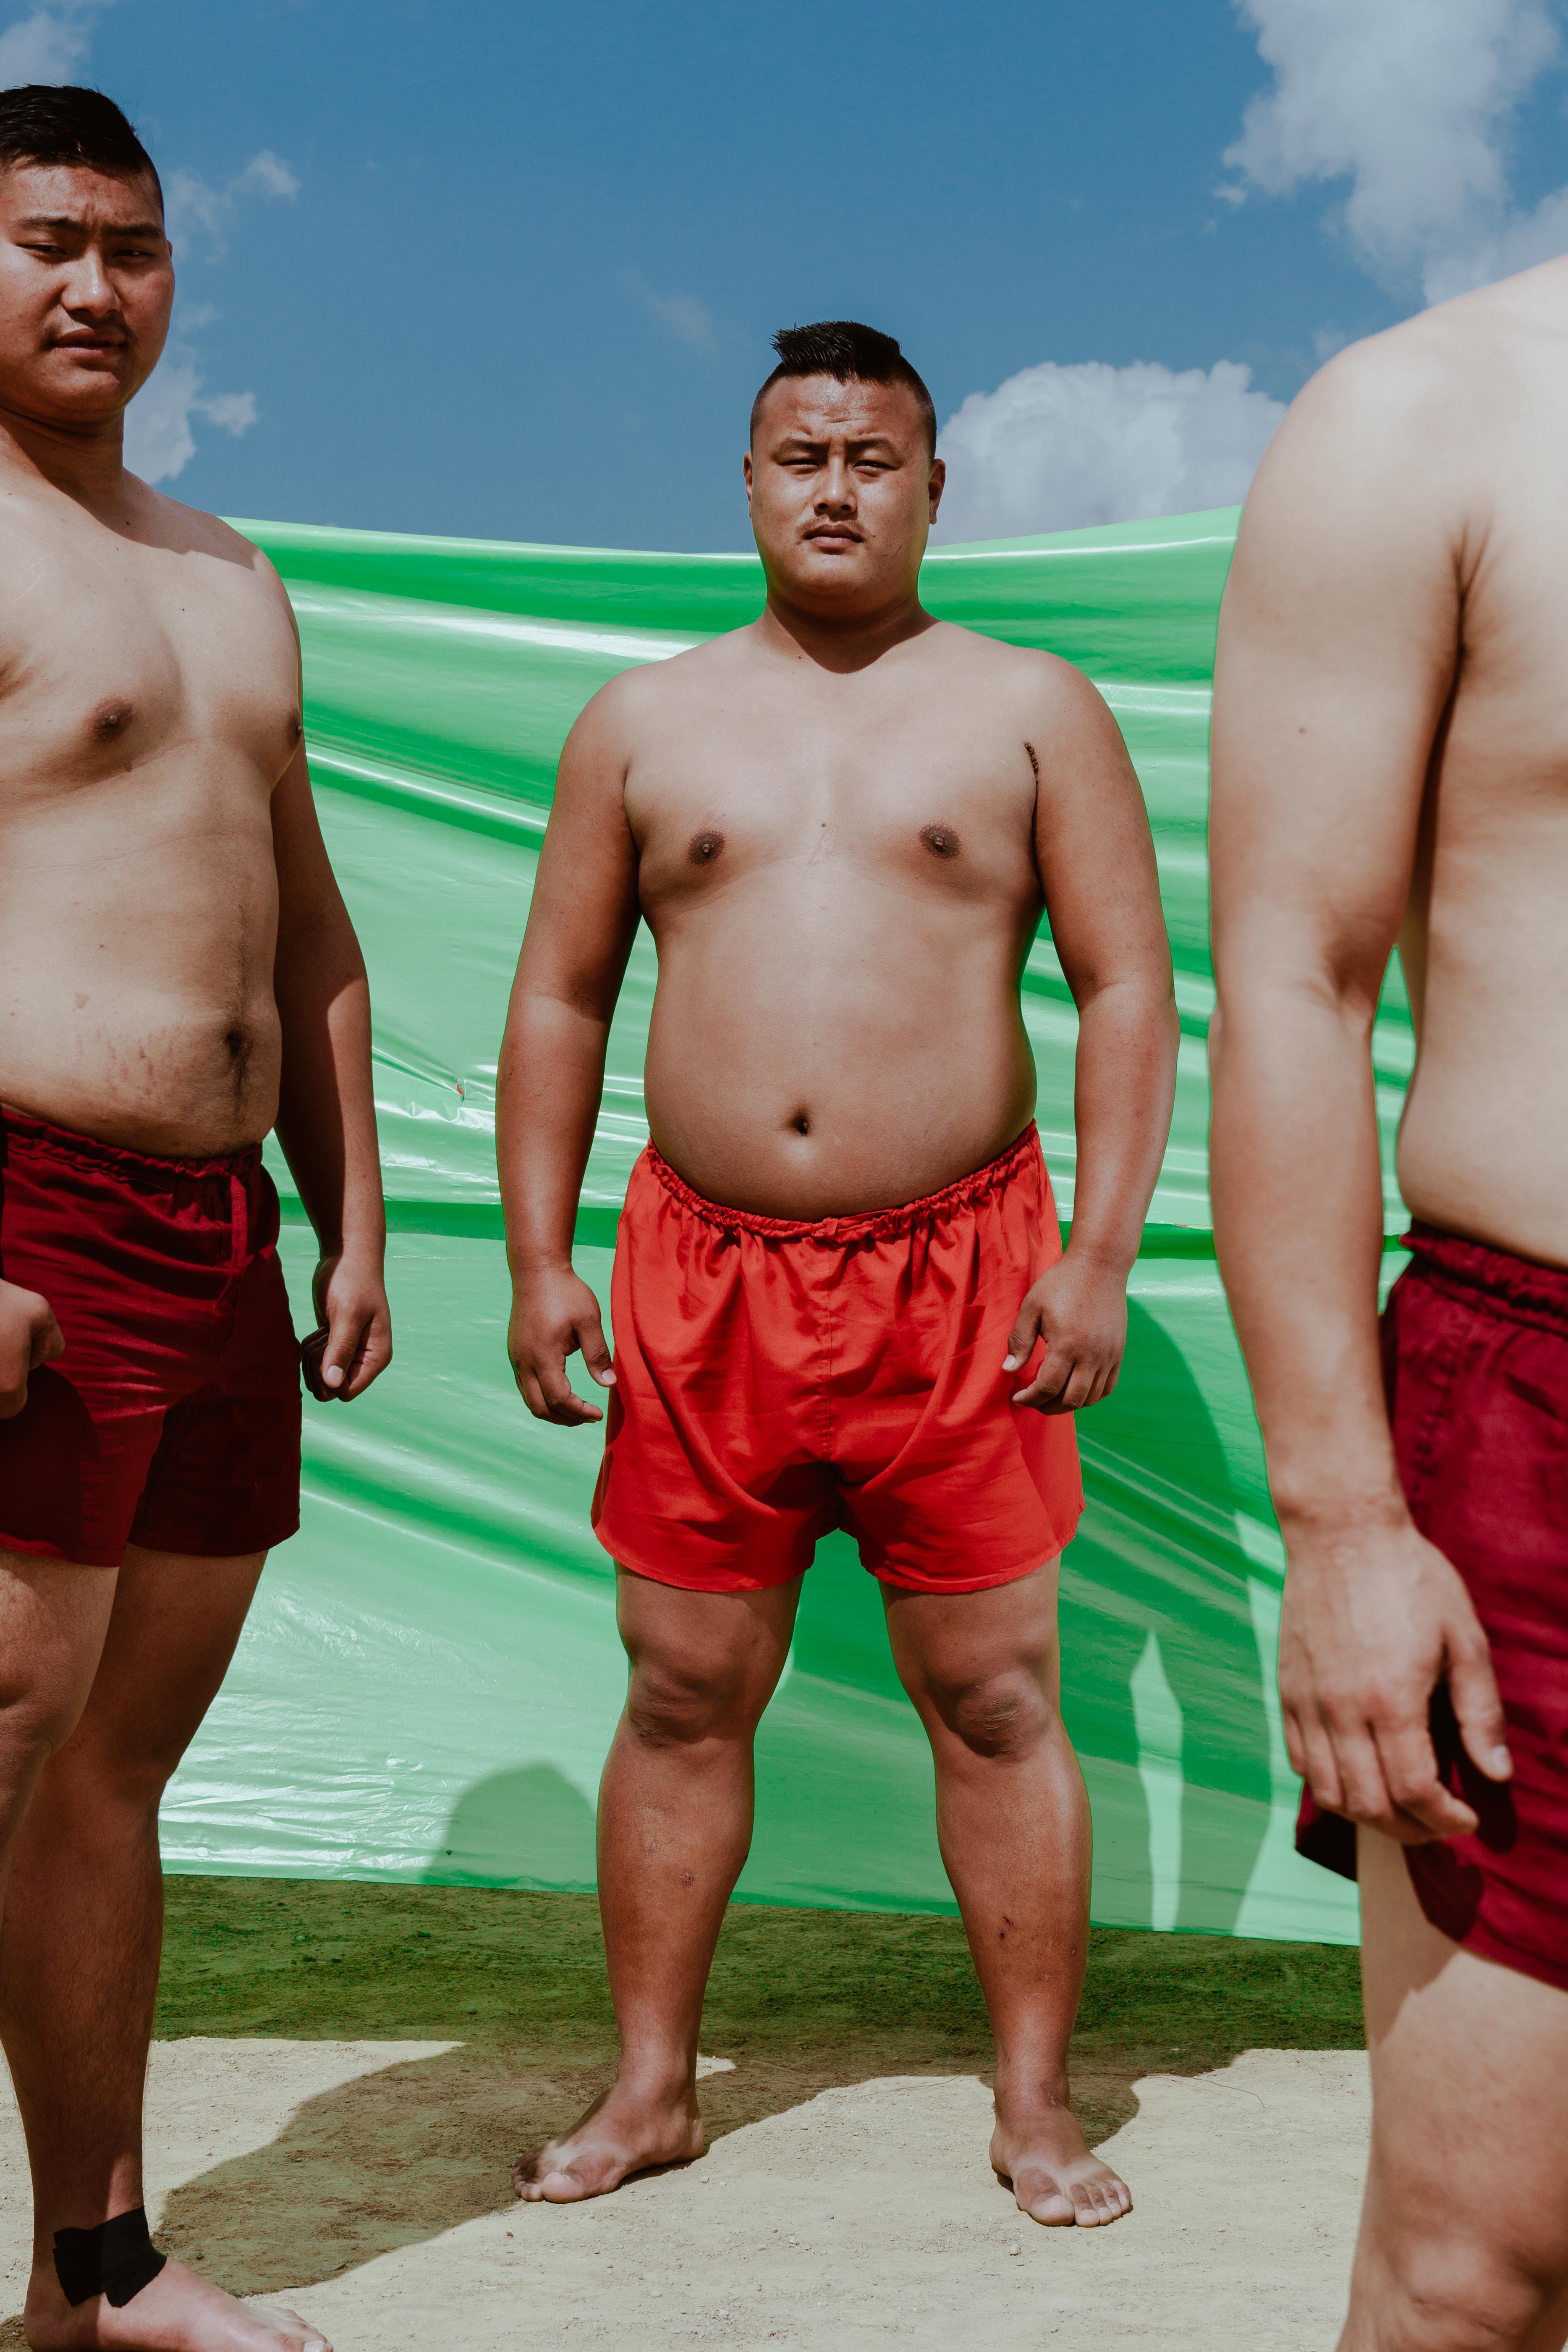 Meet, Menuosetuo Yiese, Wrestler, nagaland, India